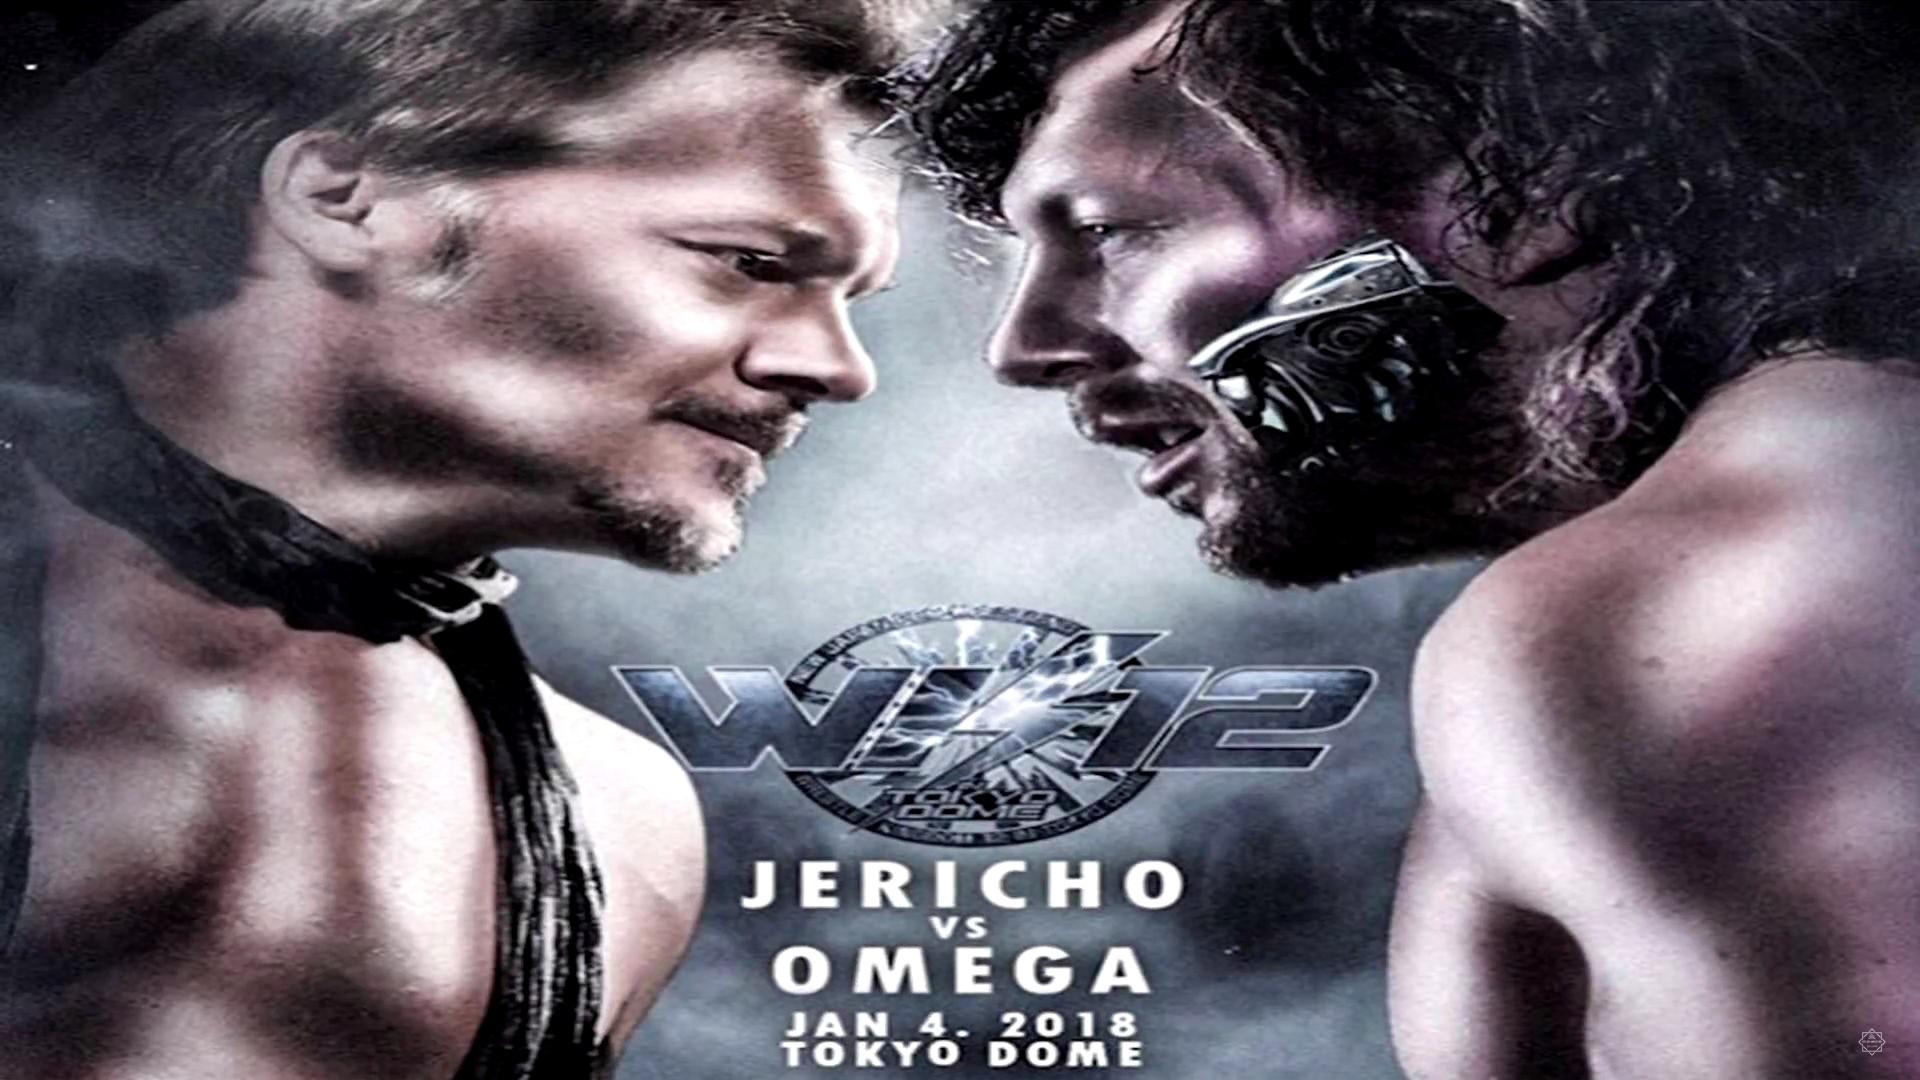 New Japan Pro Wrestling NJPW Wrestle Kingdom 12 kenny omega vs chris jericho alpha vs omega